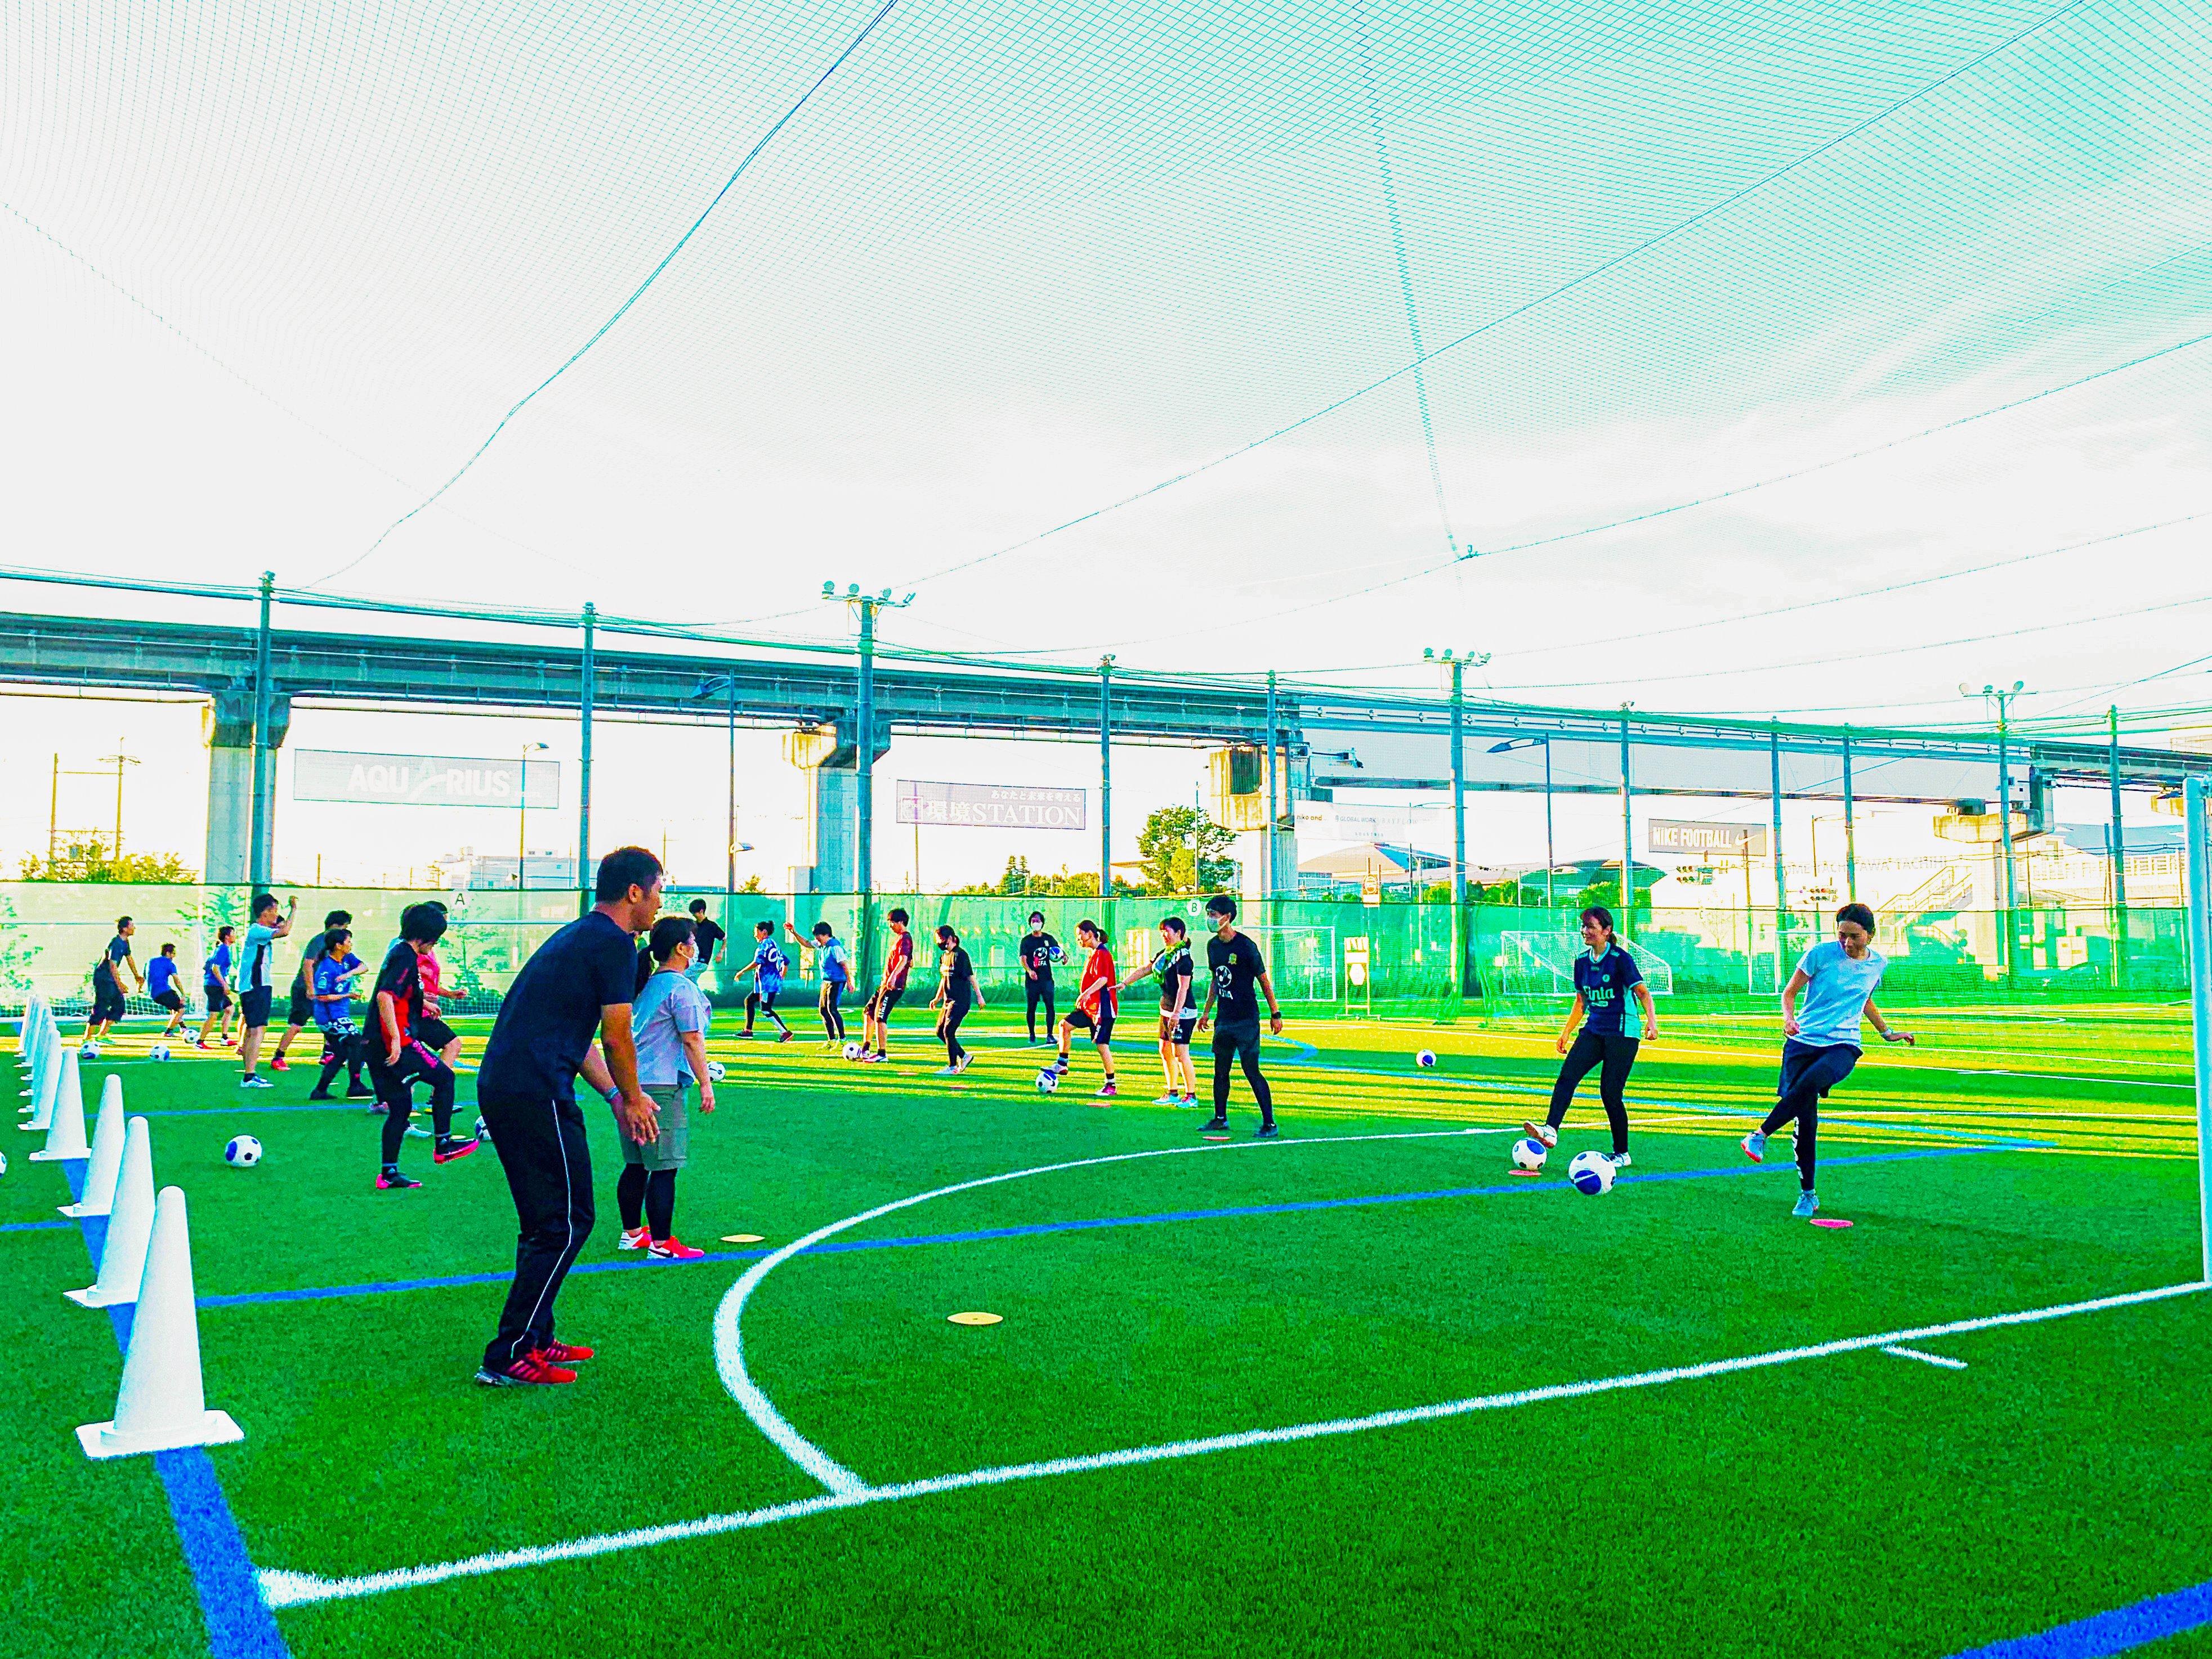 Mifa Football Park 立川 Mifa Soccer School Mifa Fp 立川 超初心者クリニック フットサルを始めたい方にオススメの 超初心者クリニック ボールを触れる楽しさを感じながら止める 蹴る 運ぶの基礎を練習し最後は試合も行います 安心して